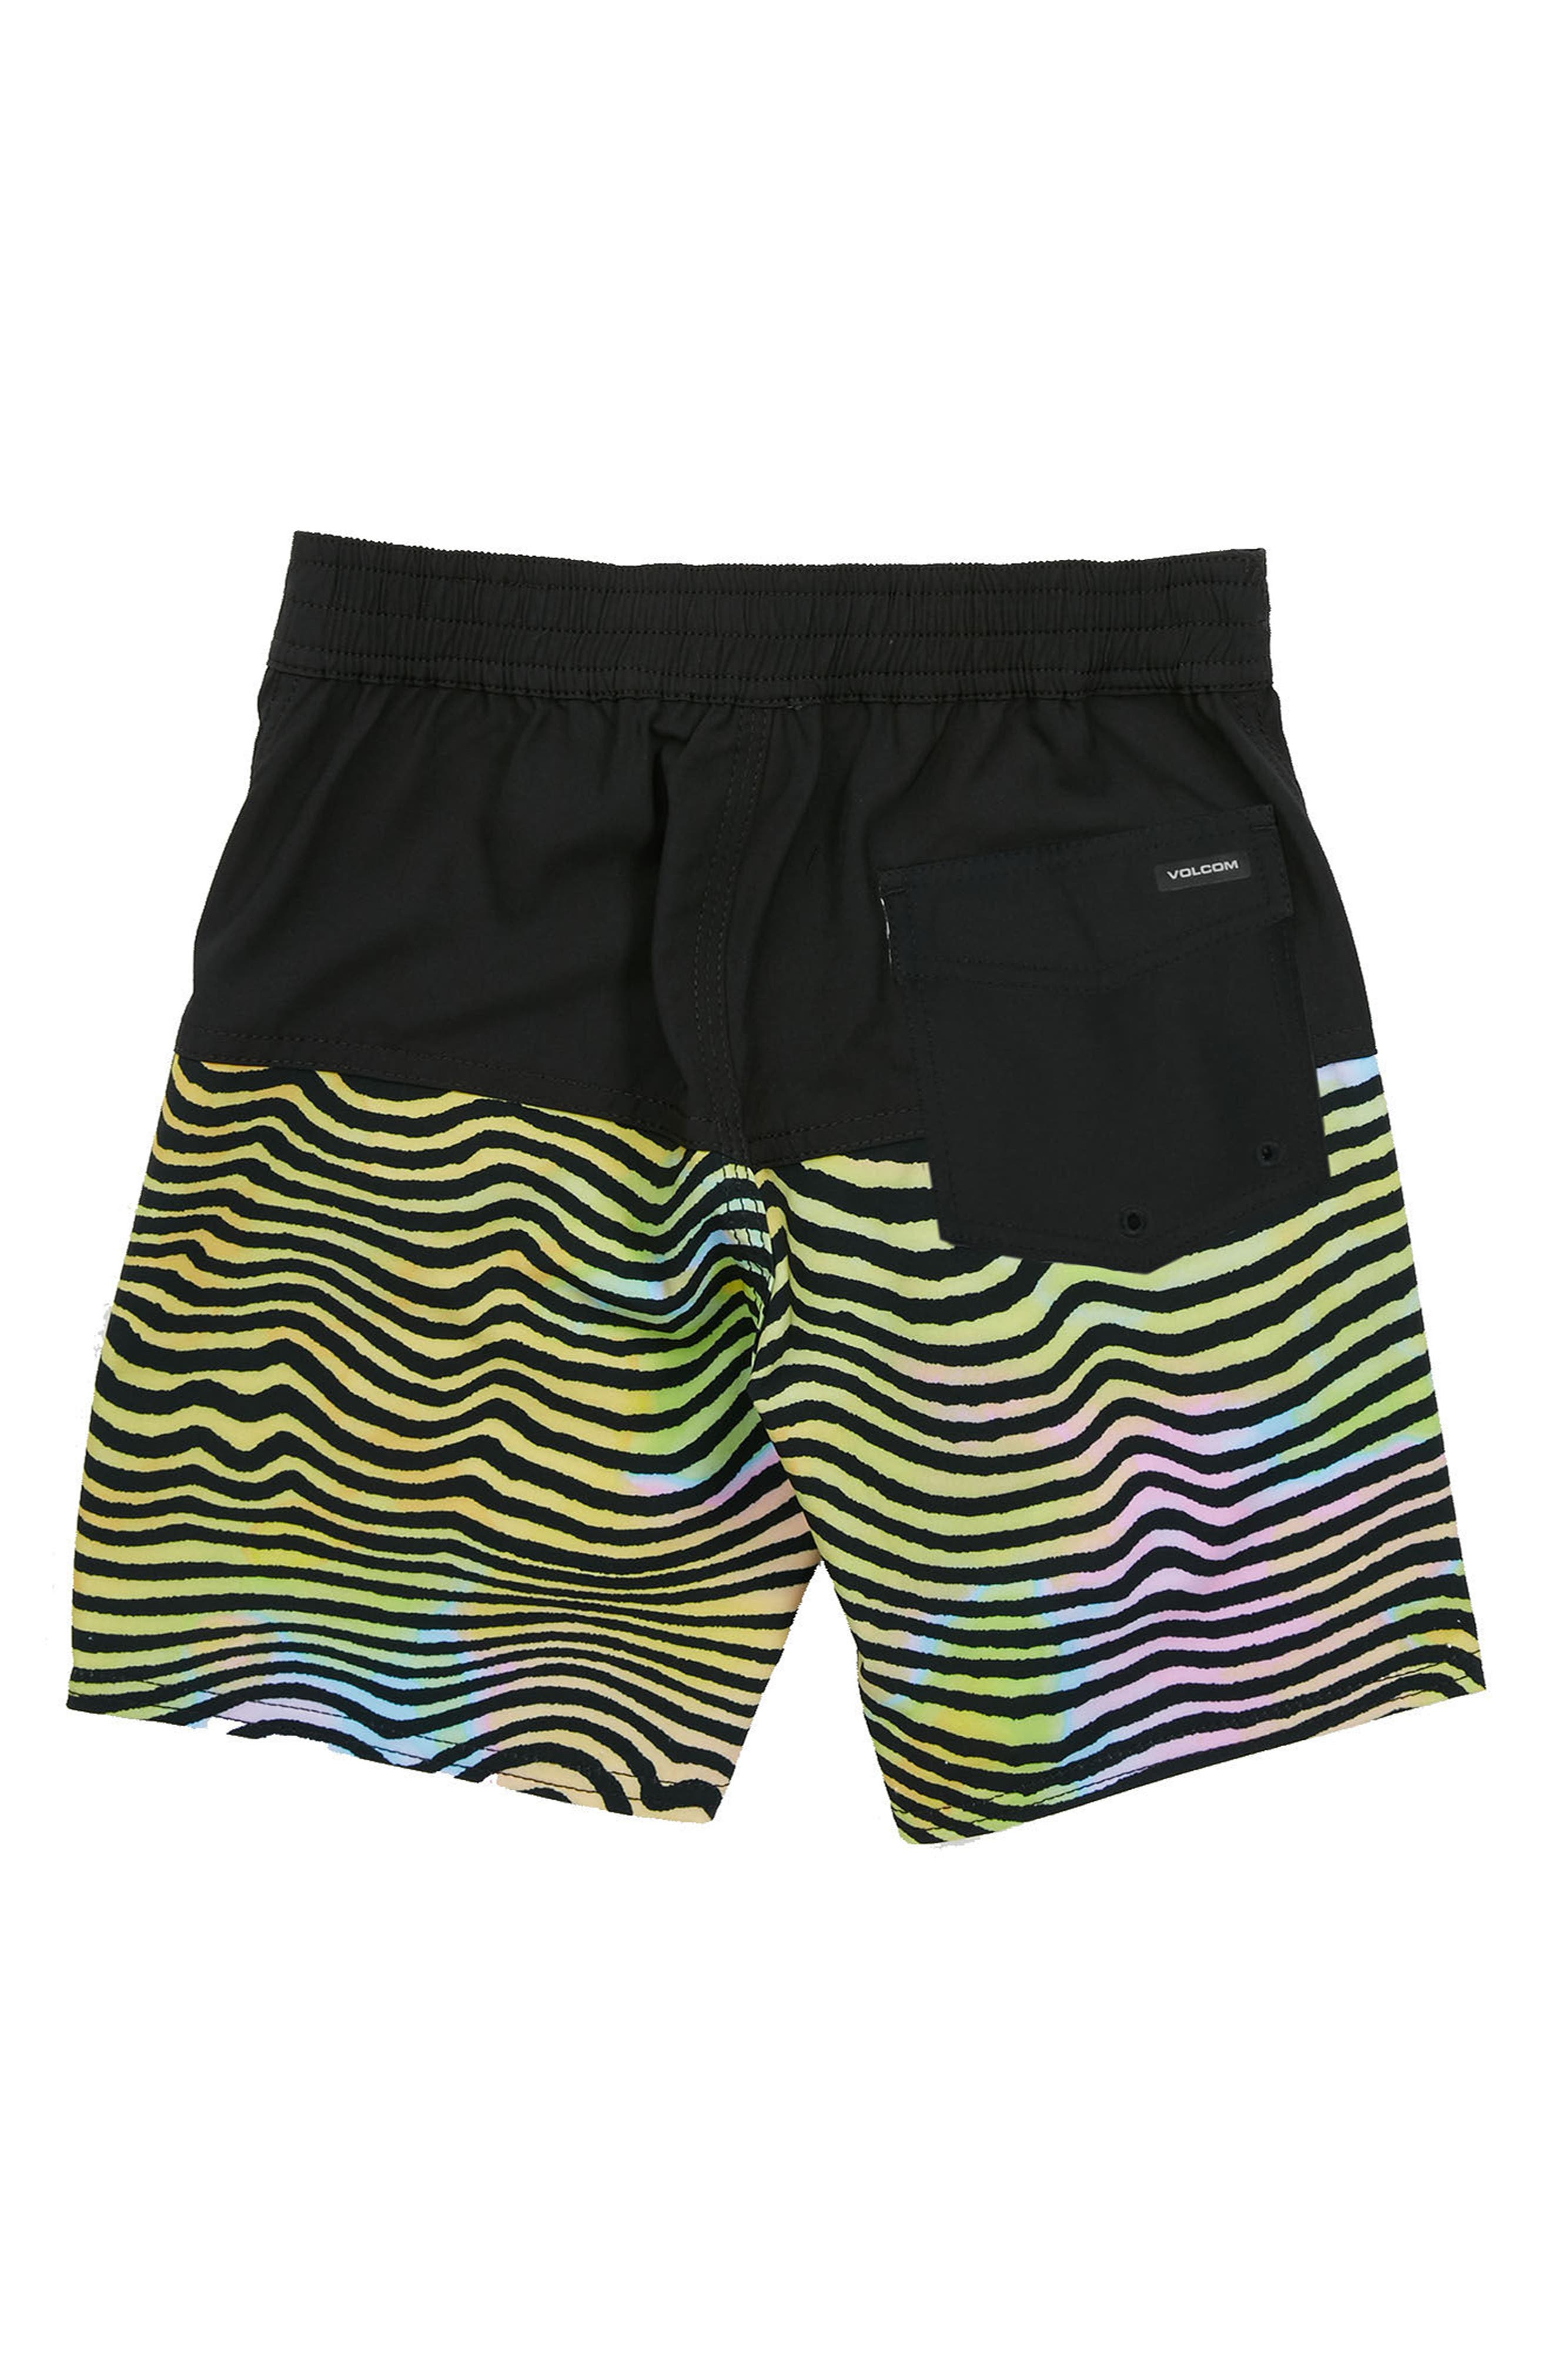 VOLCOM,                             Vibes Board Shorts,                             Alternate thumbnail 2, color,                             001